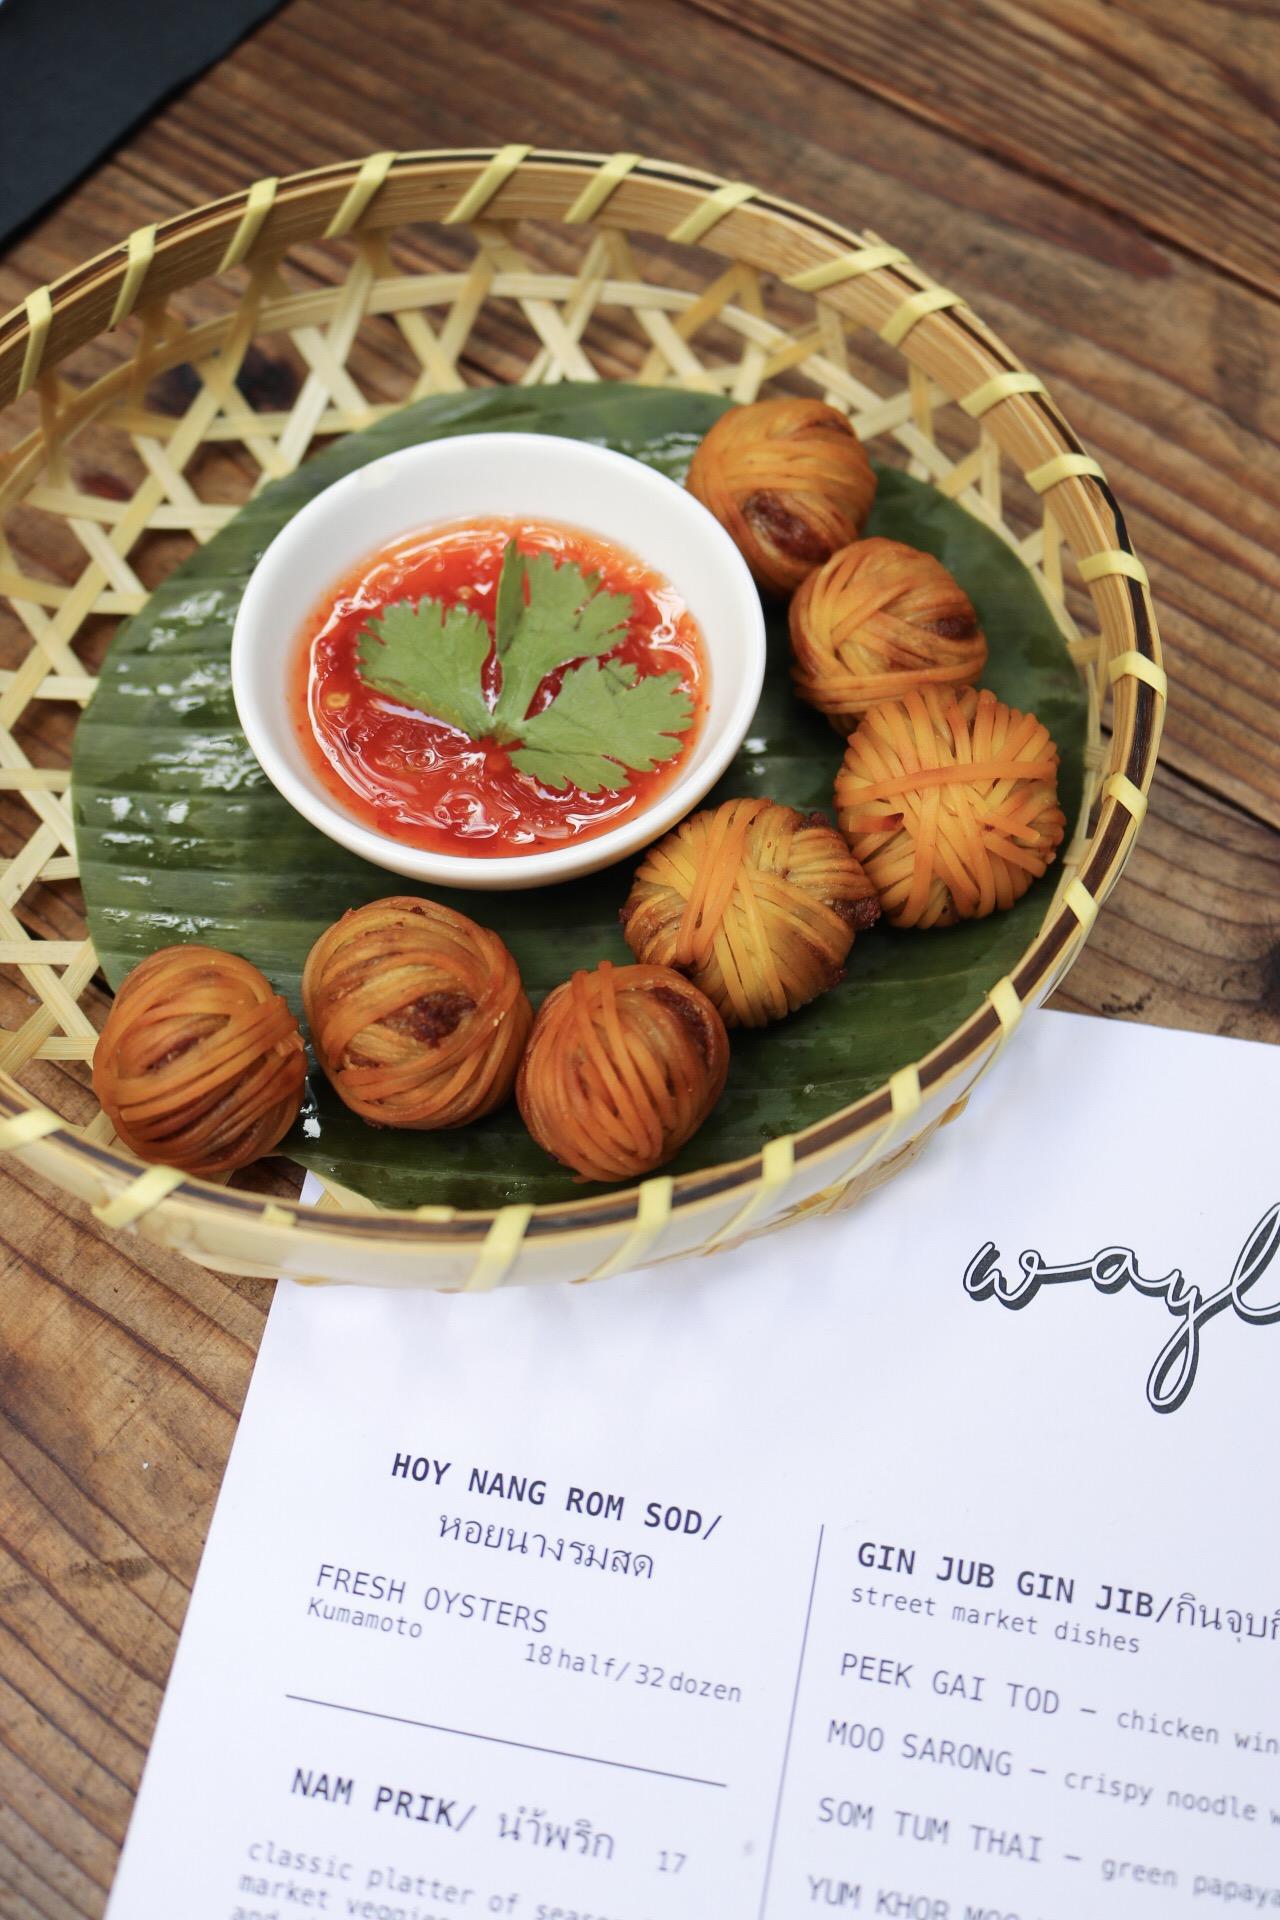 Meatballs (Moo Sarong) Wayla NYC